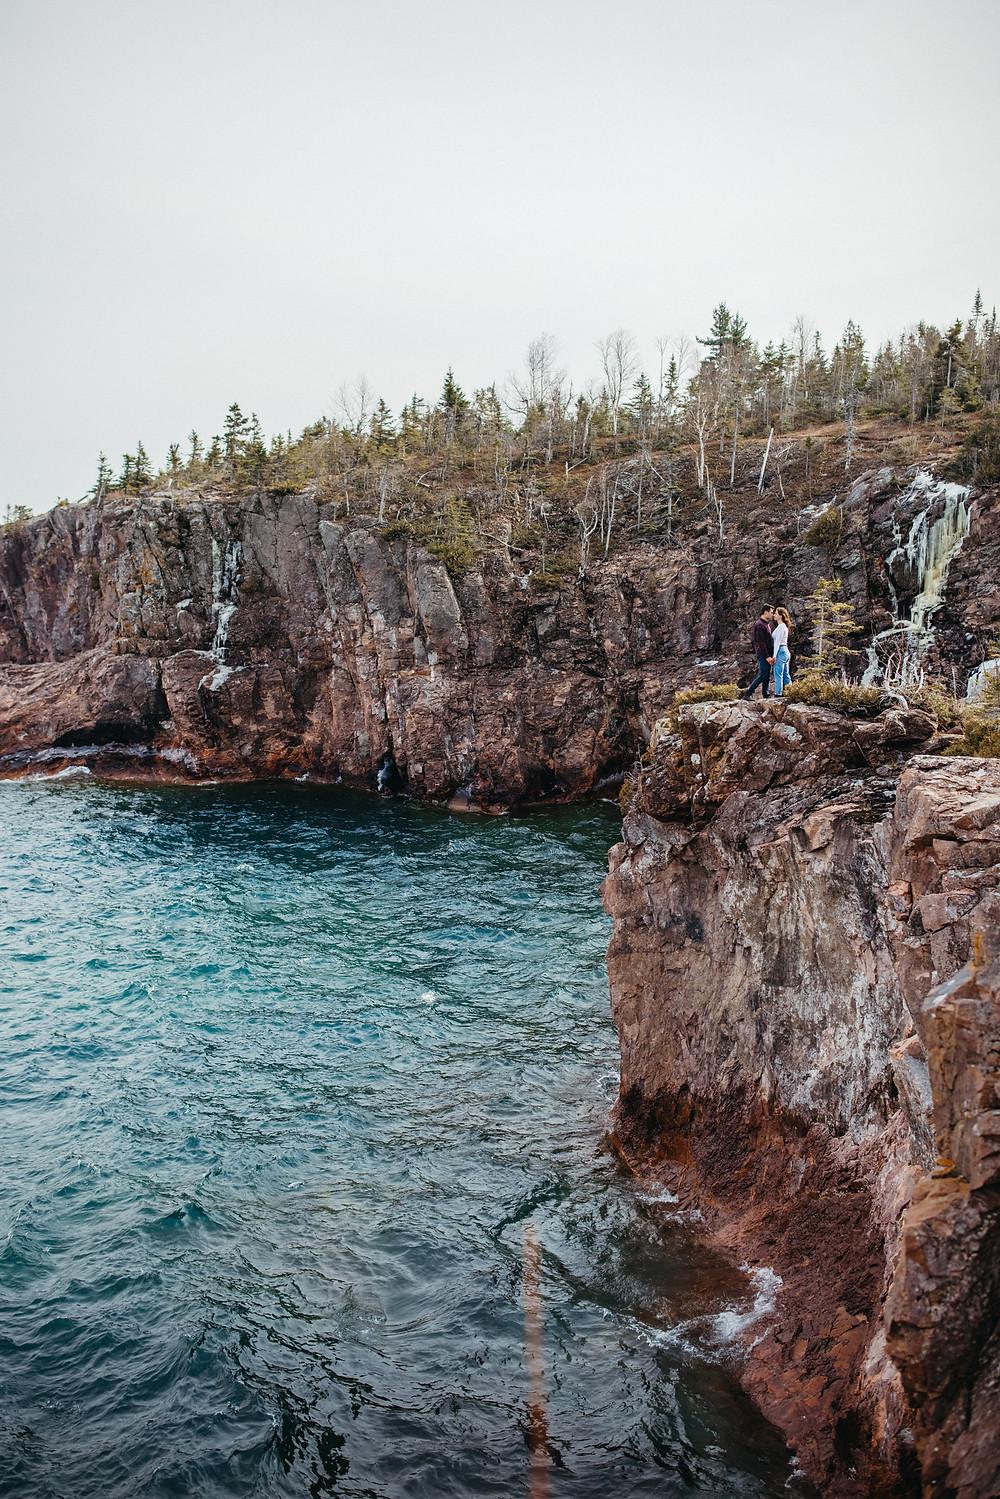 https://en.wikipedia.org/wiki/North_Shore_(Lake_Superior)